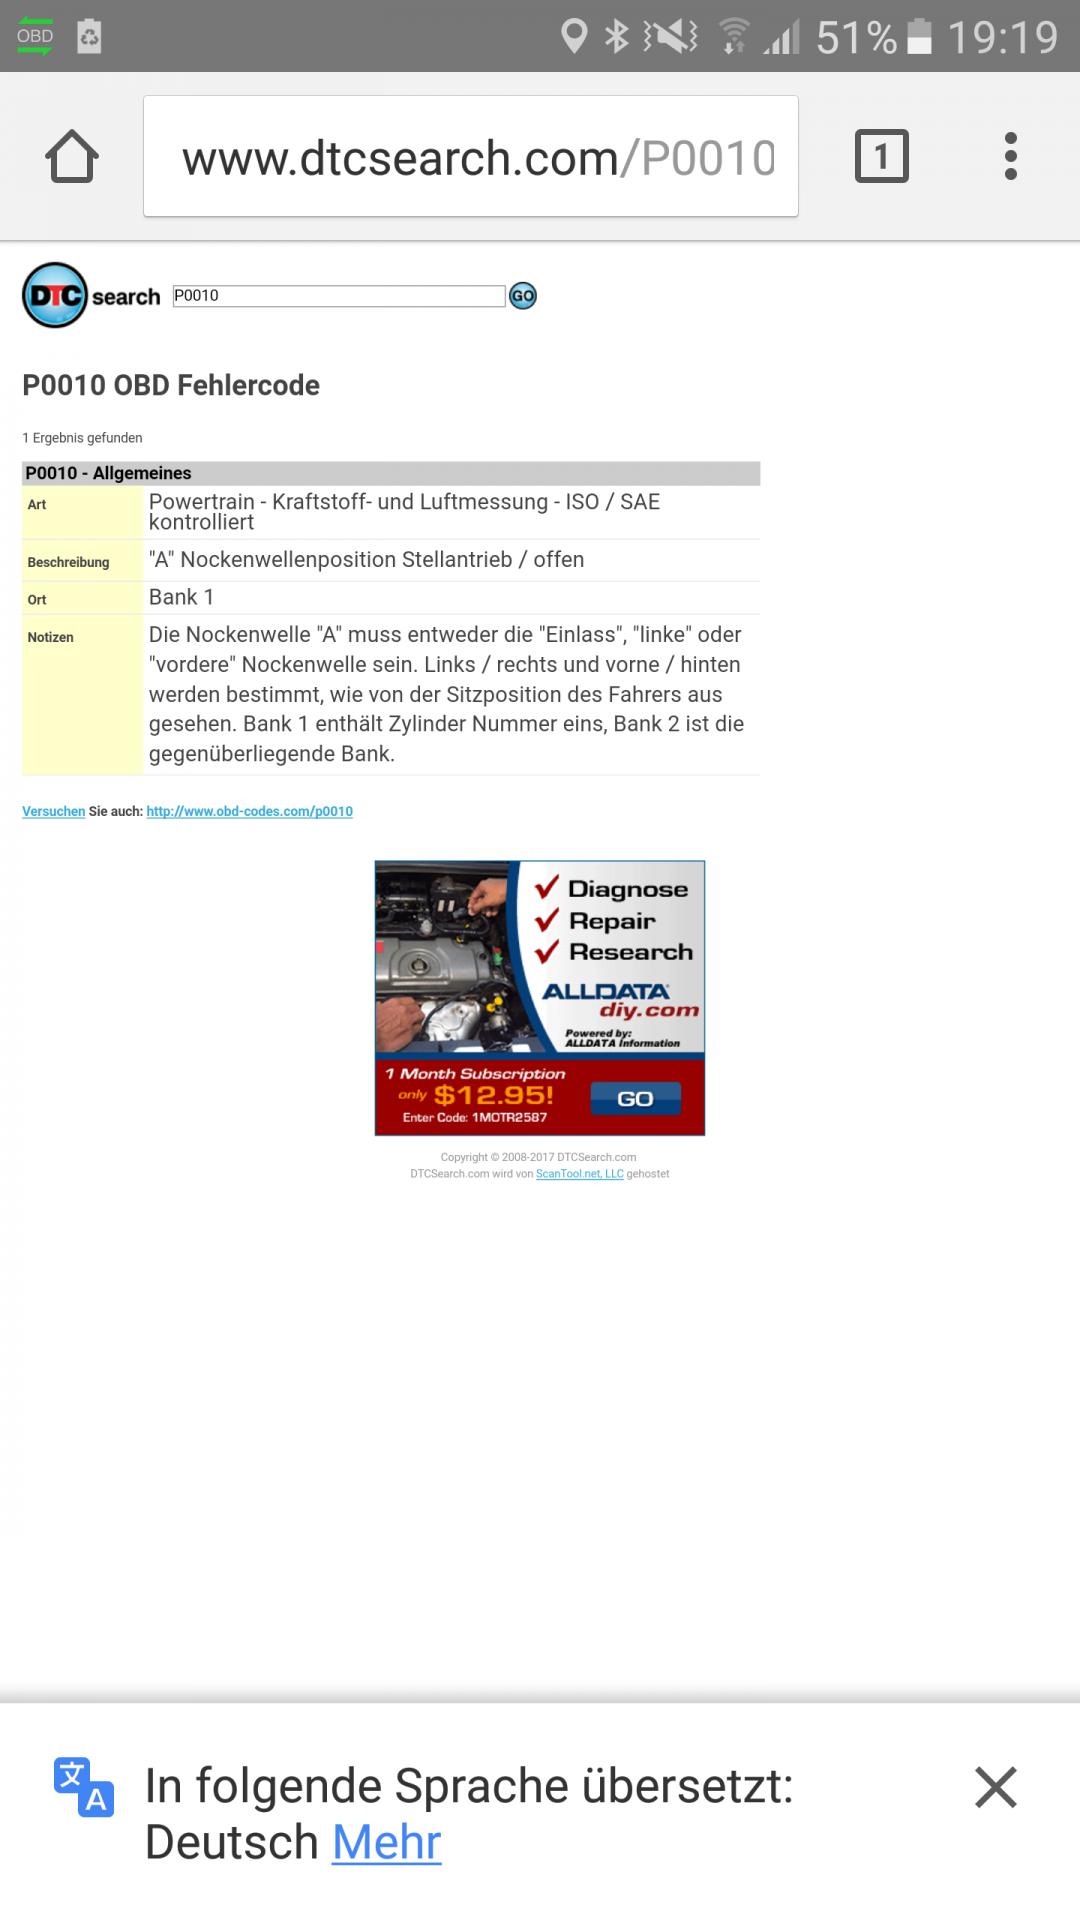 Screenshot_20170309-191936.png